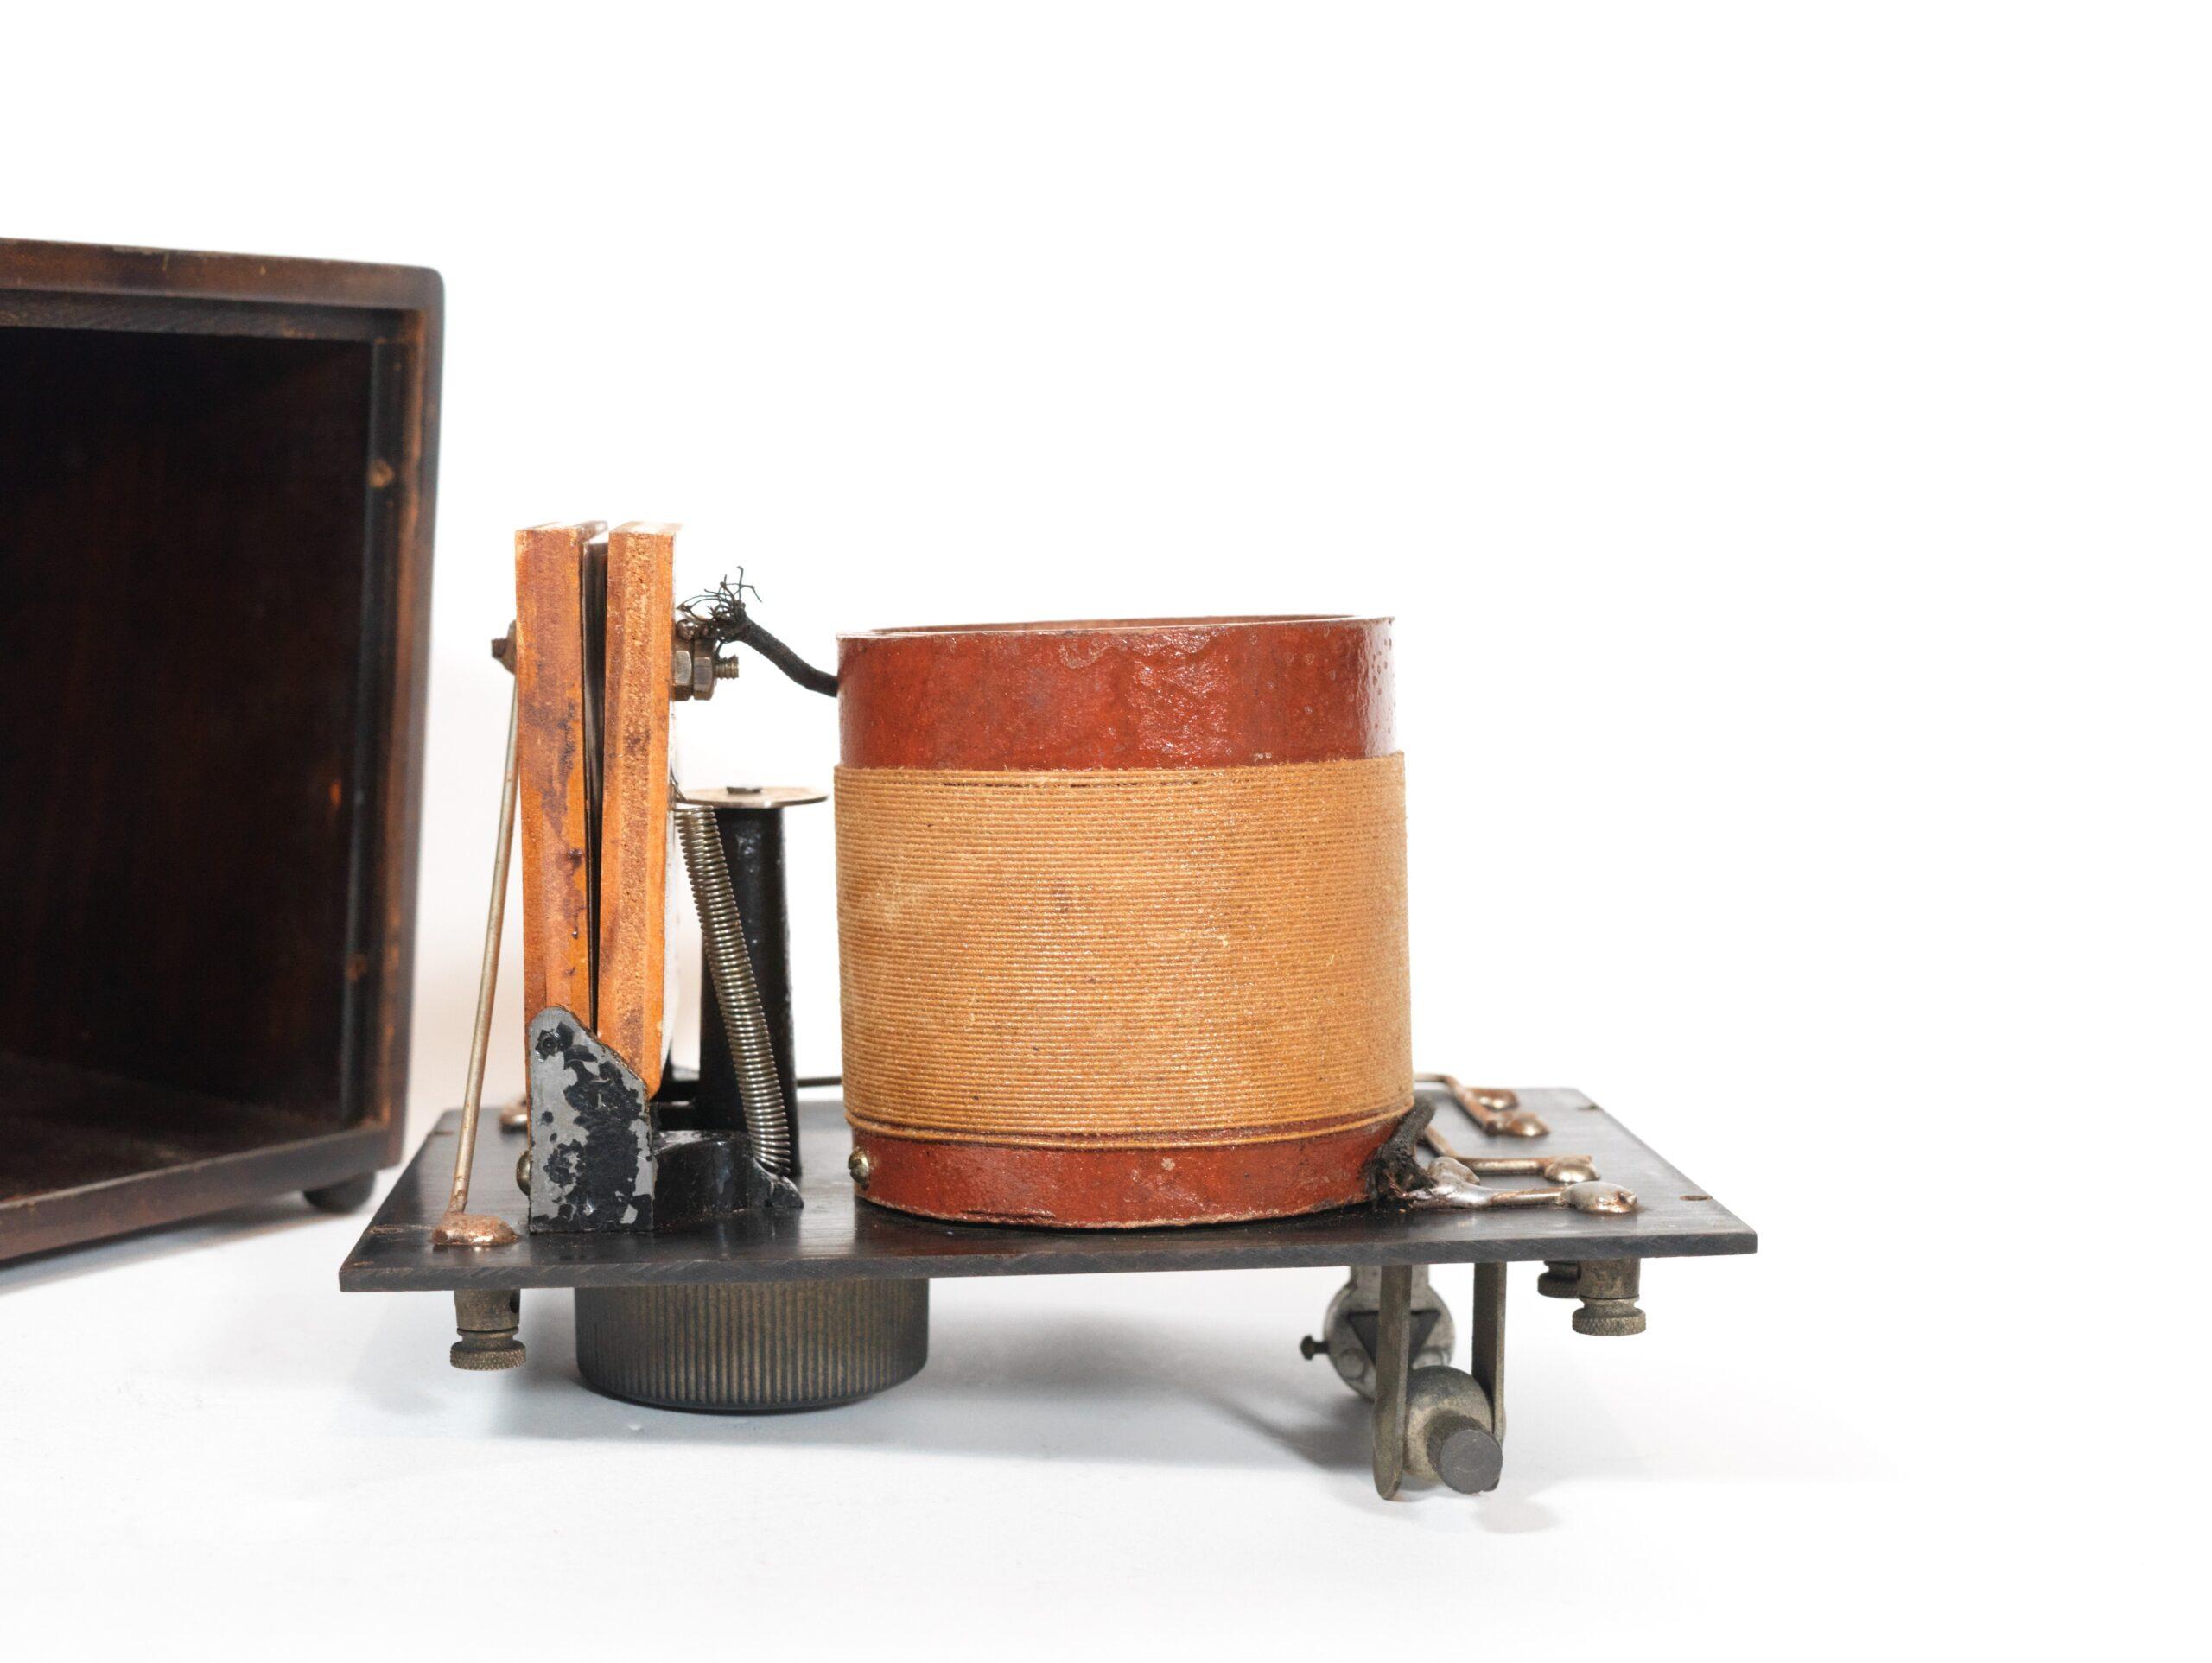 1922 Crosley Crystal Radio Model 1